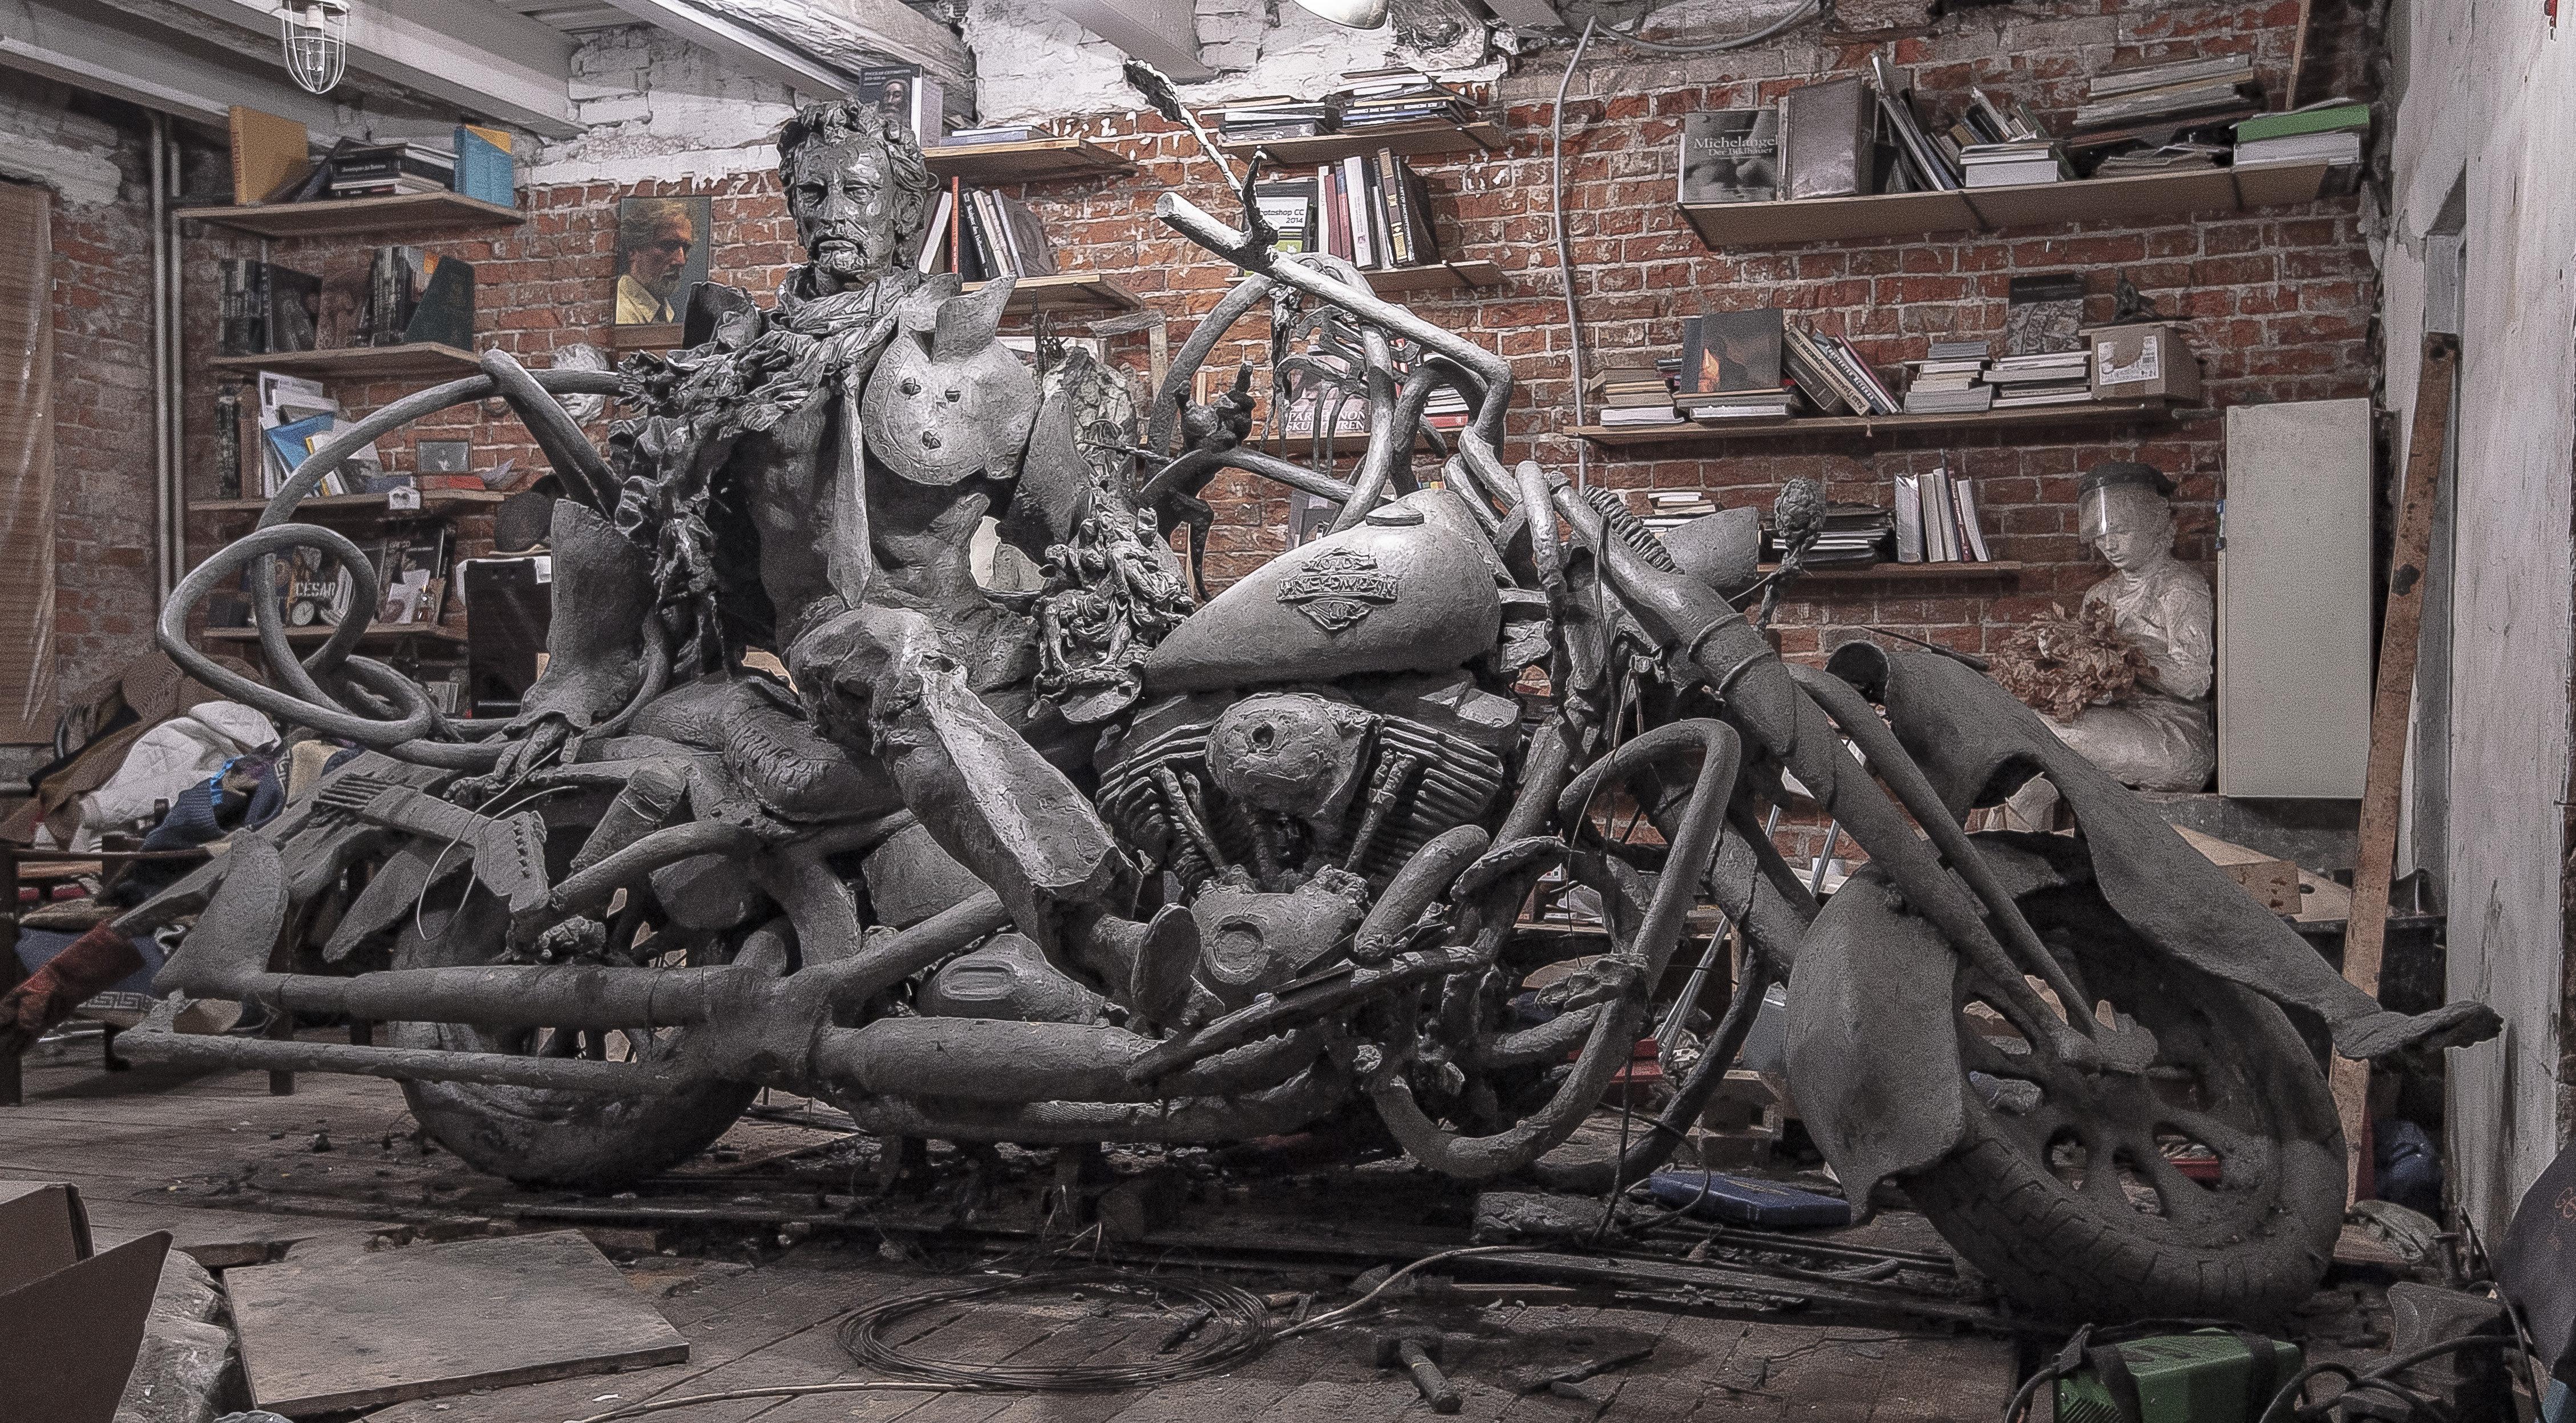 Statue de Johnny Hallyday du sculpteur russe, Alexey Blagovestnov